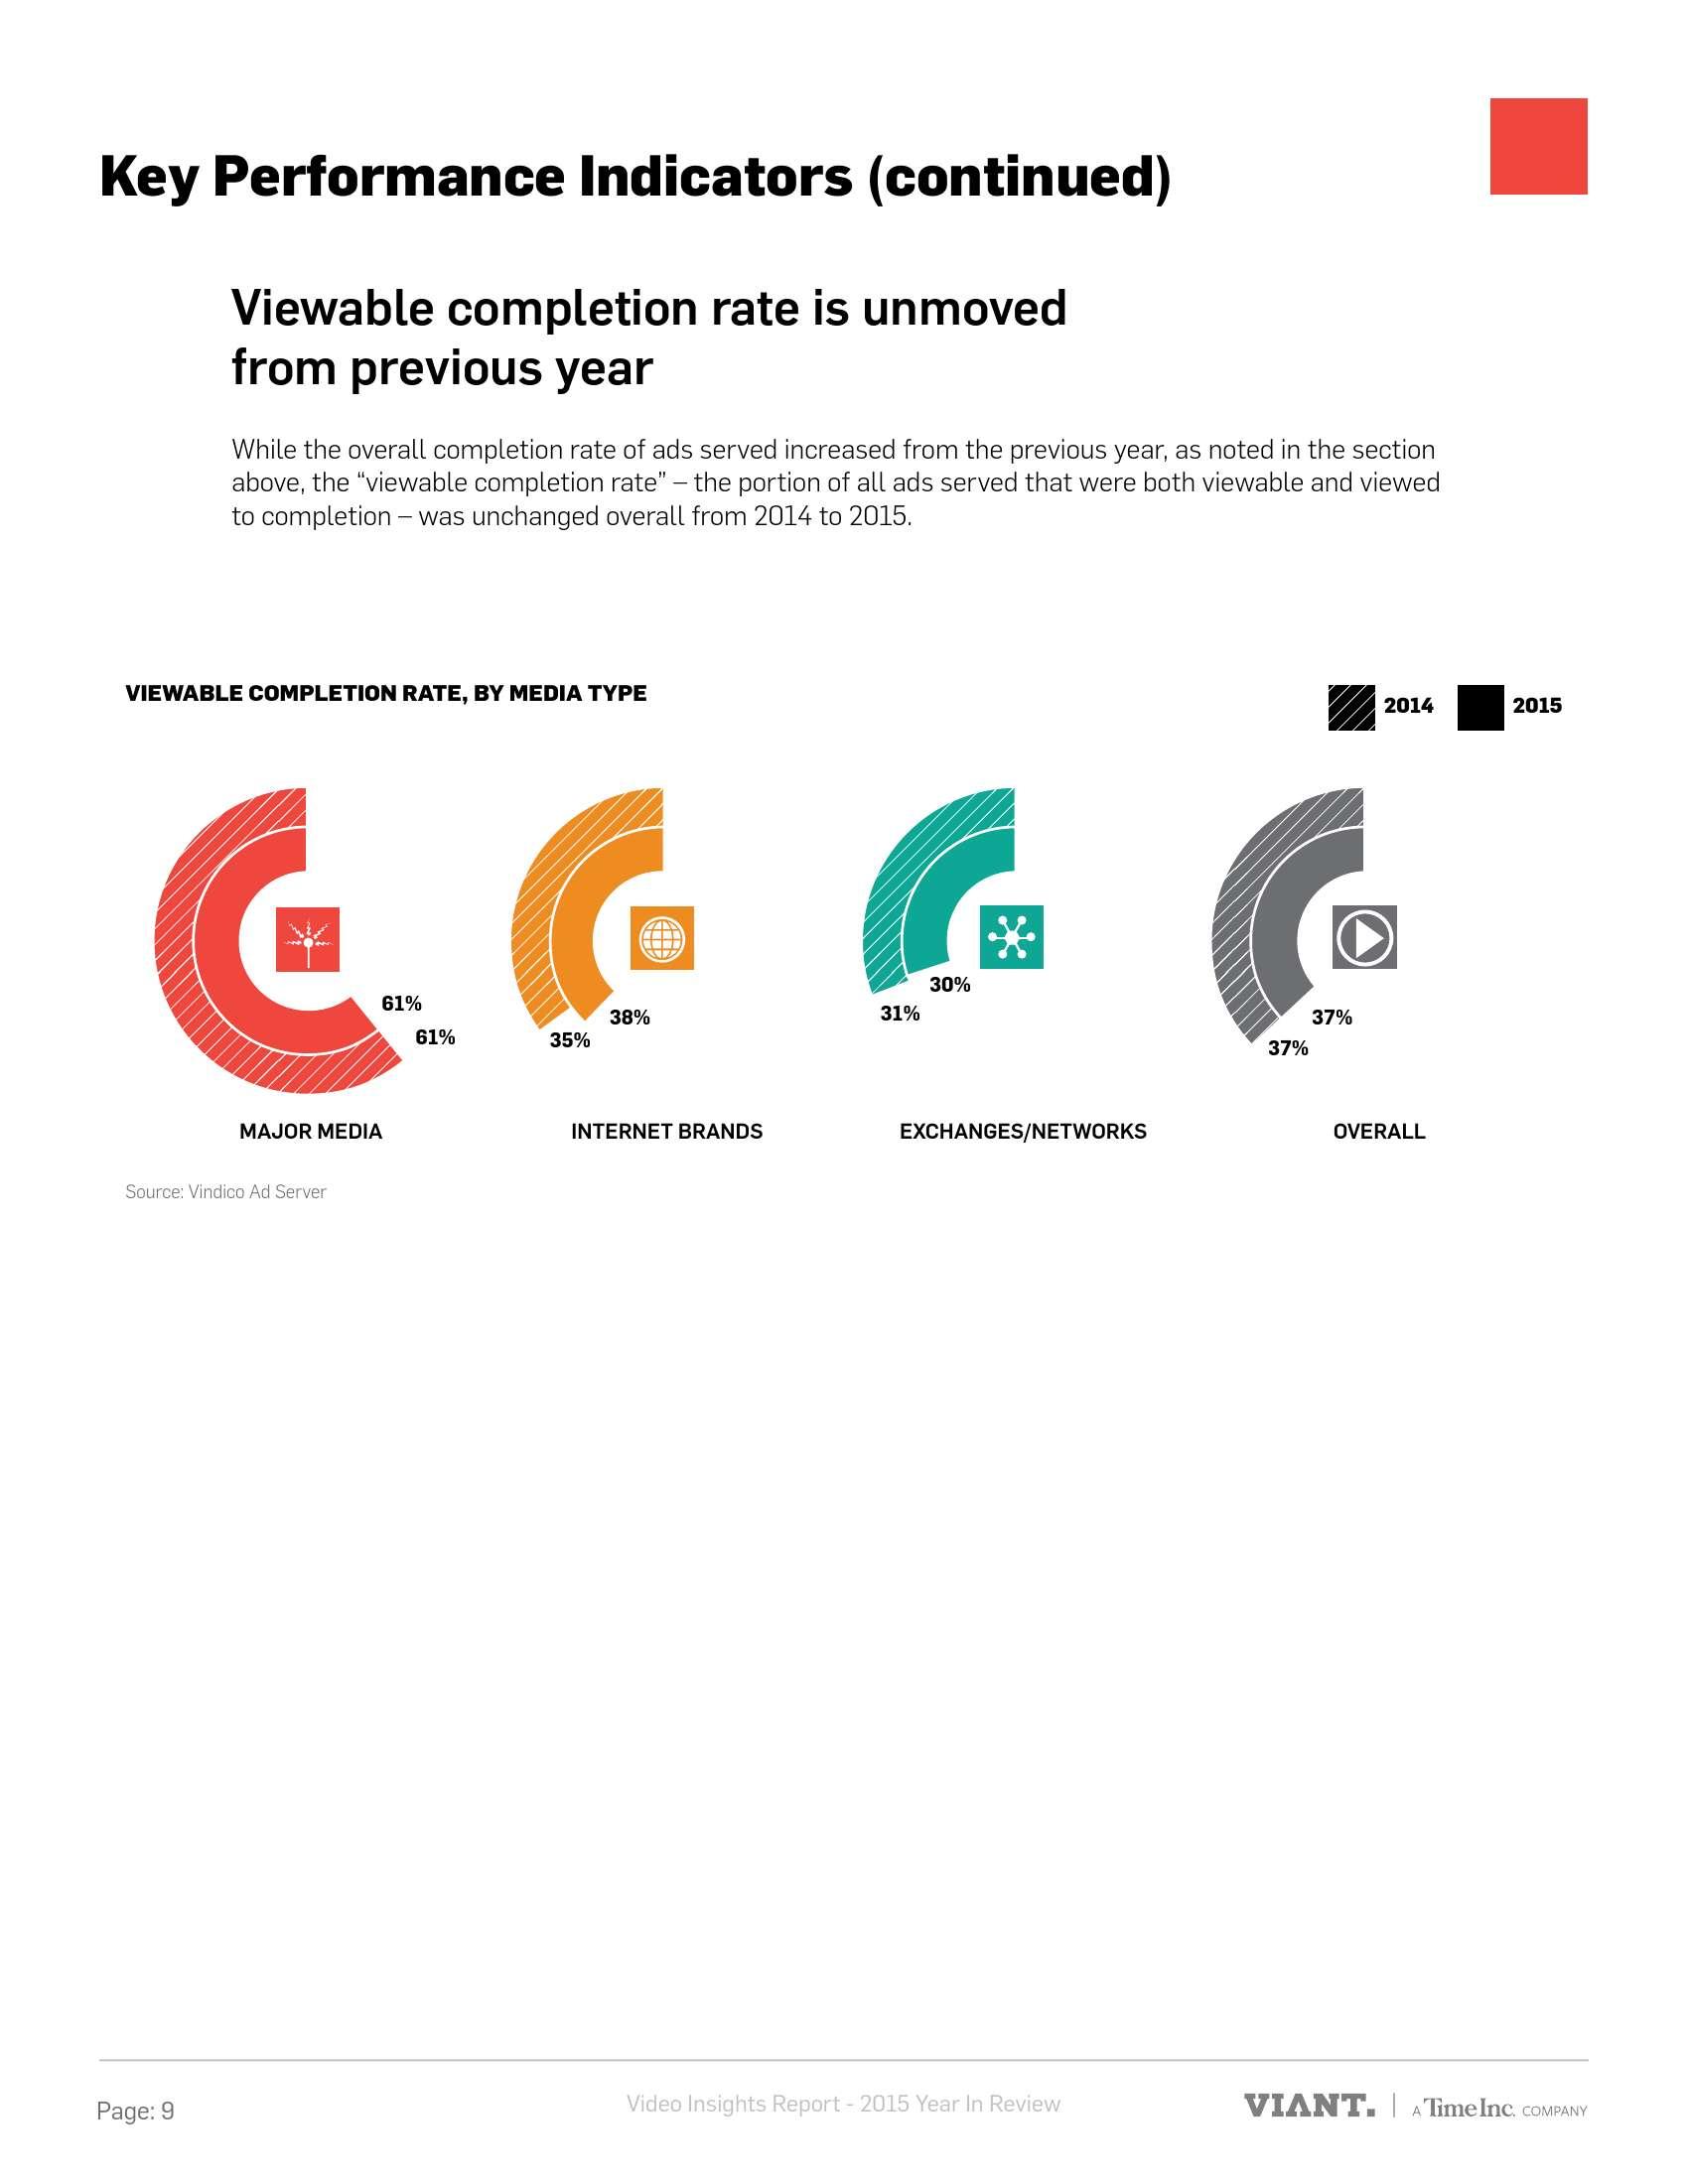 Viant:2015年视频广告趋势分析报告_000009